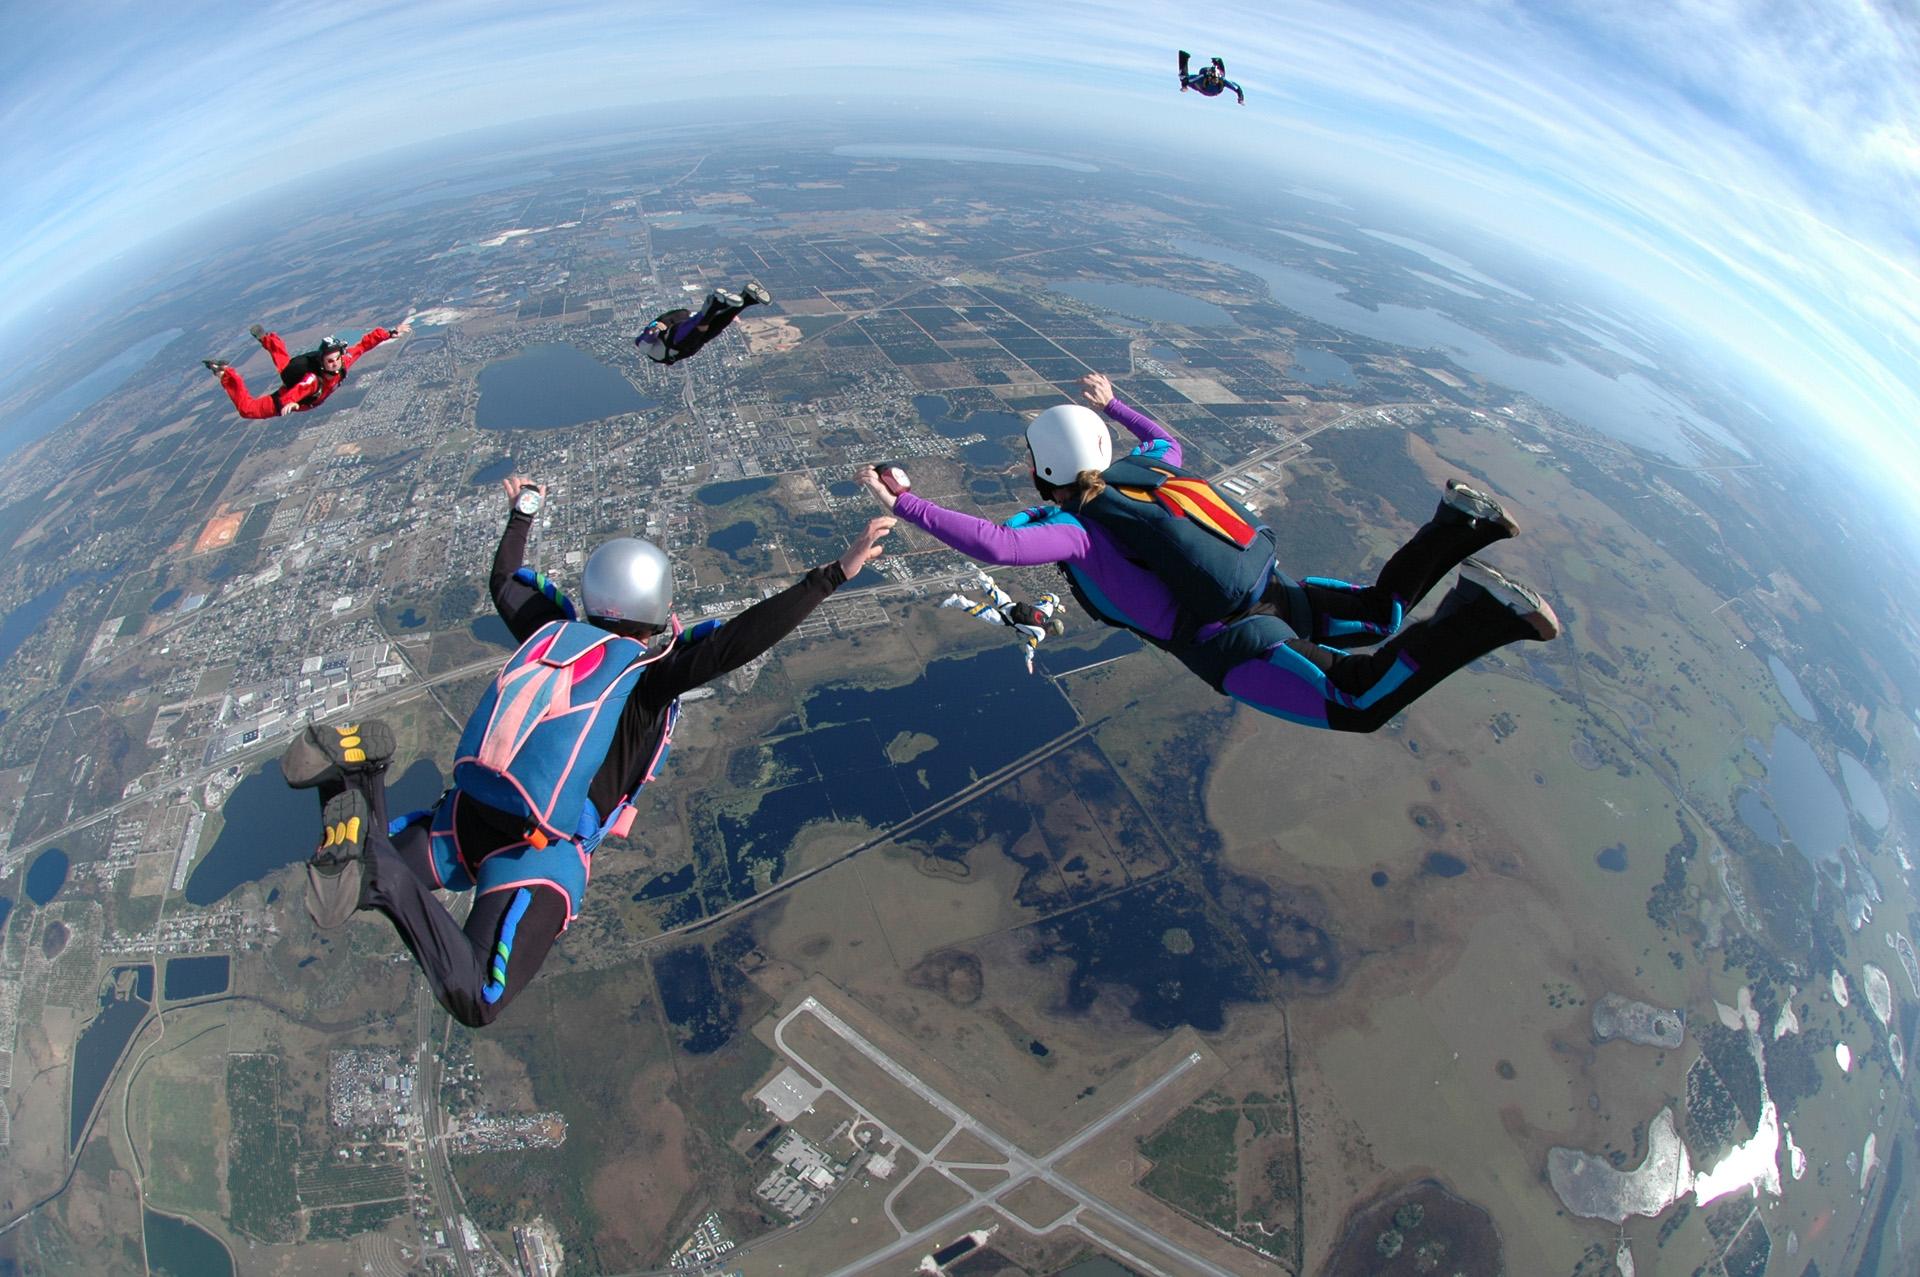 Dagje weg met vriend parachutespringen